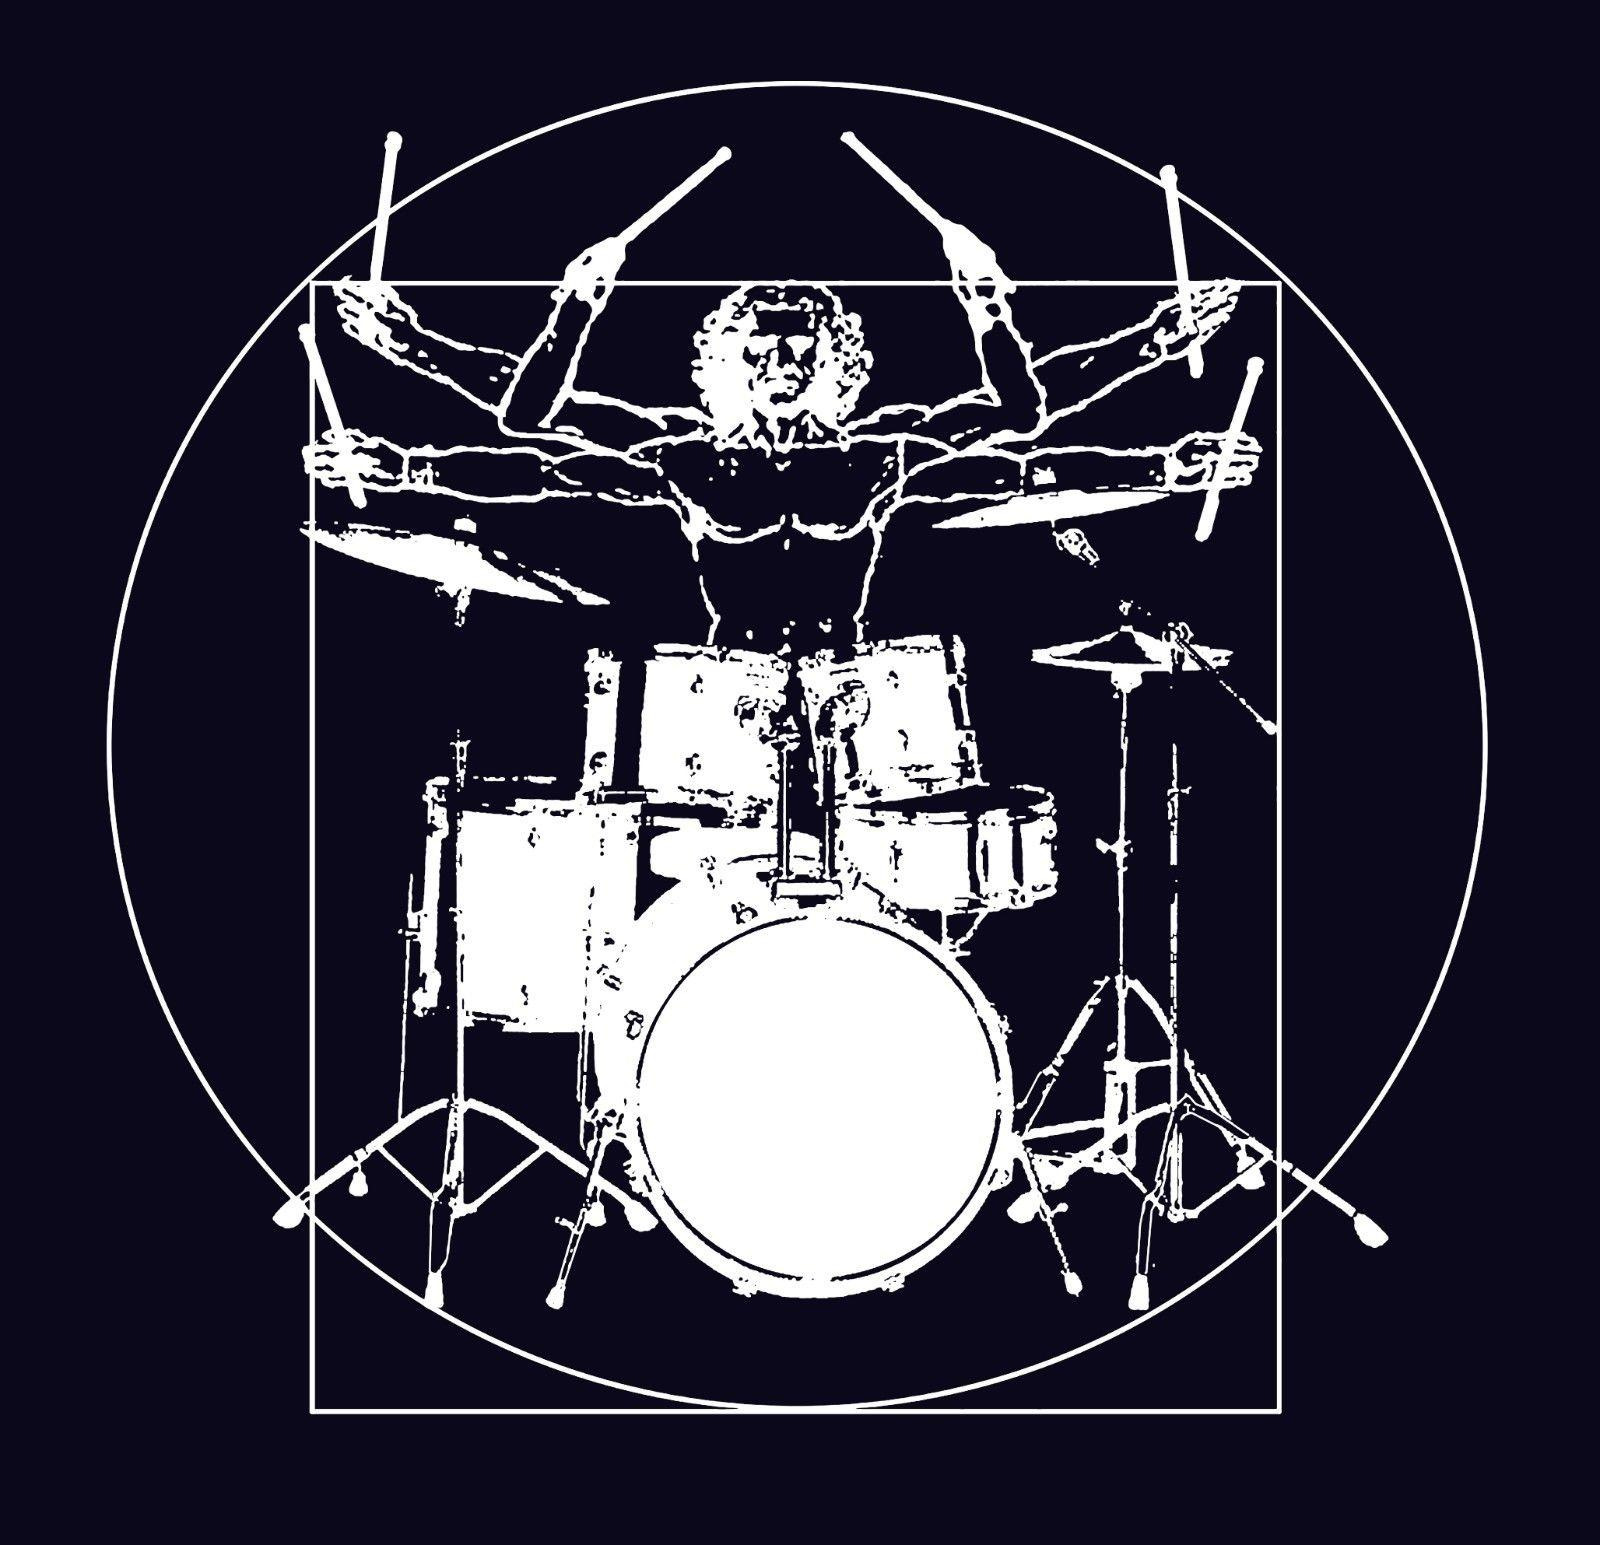 79103716 Drummer Vitruvian Man T Shirt Drum Set Print Music T Shirts Black Remix Funny  Funny Unisex Casual Gift With T Shirt T Shirts Shopping From  Free_will_shirts, ...